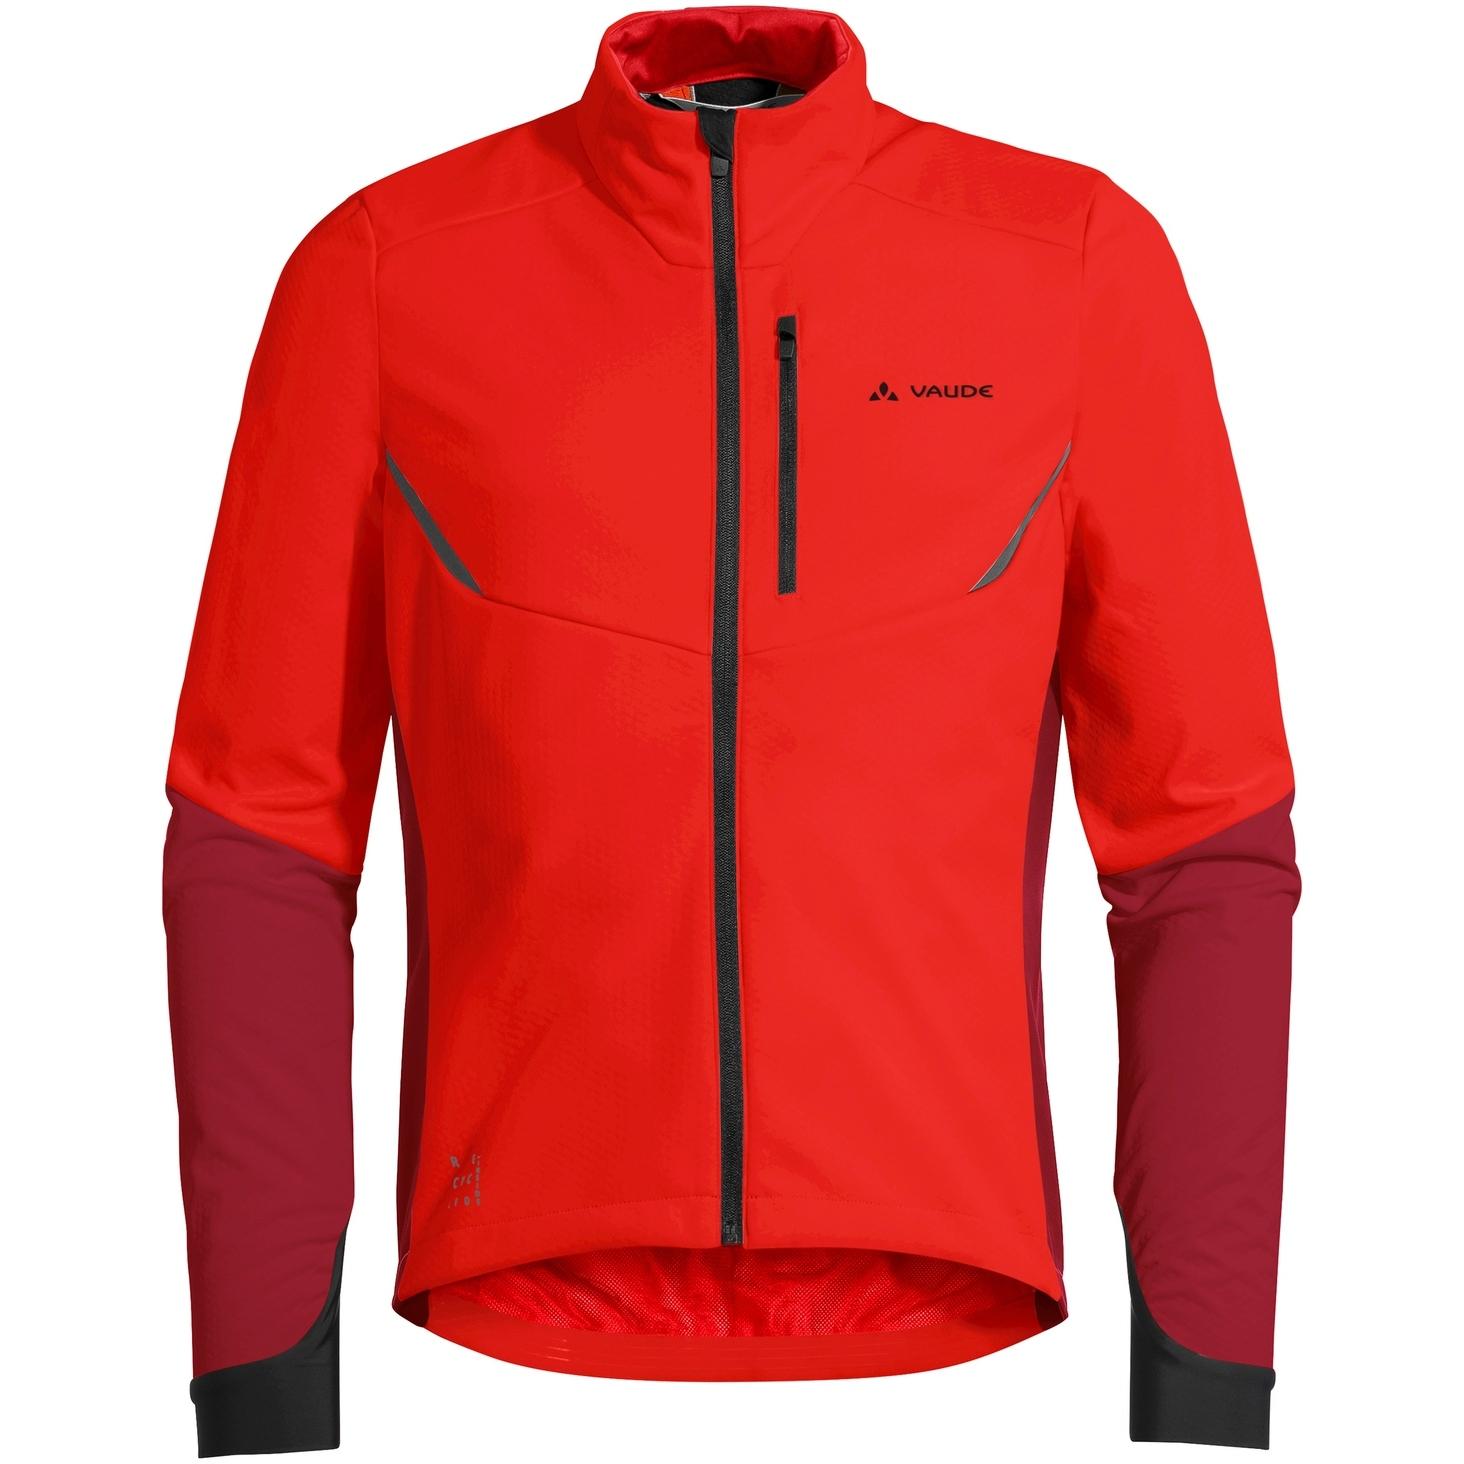 Vaude Men's Kuro Softshell Jacket - mars red